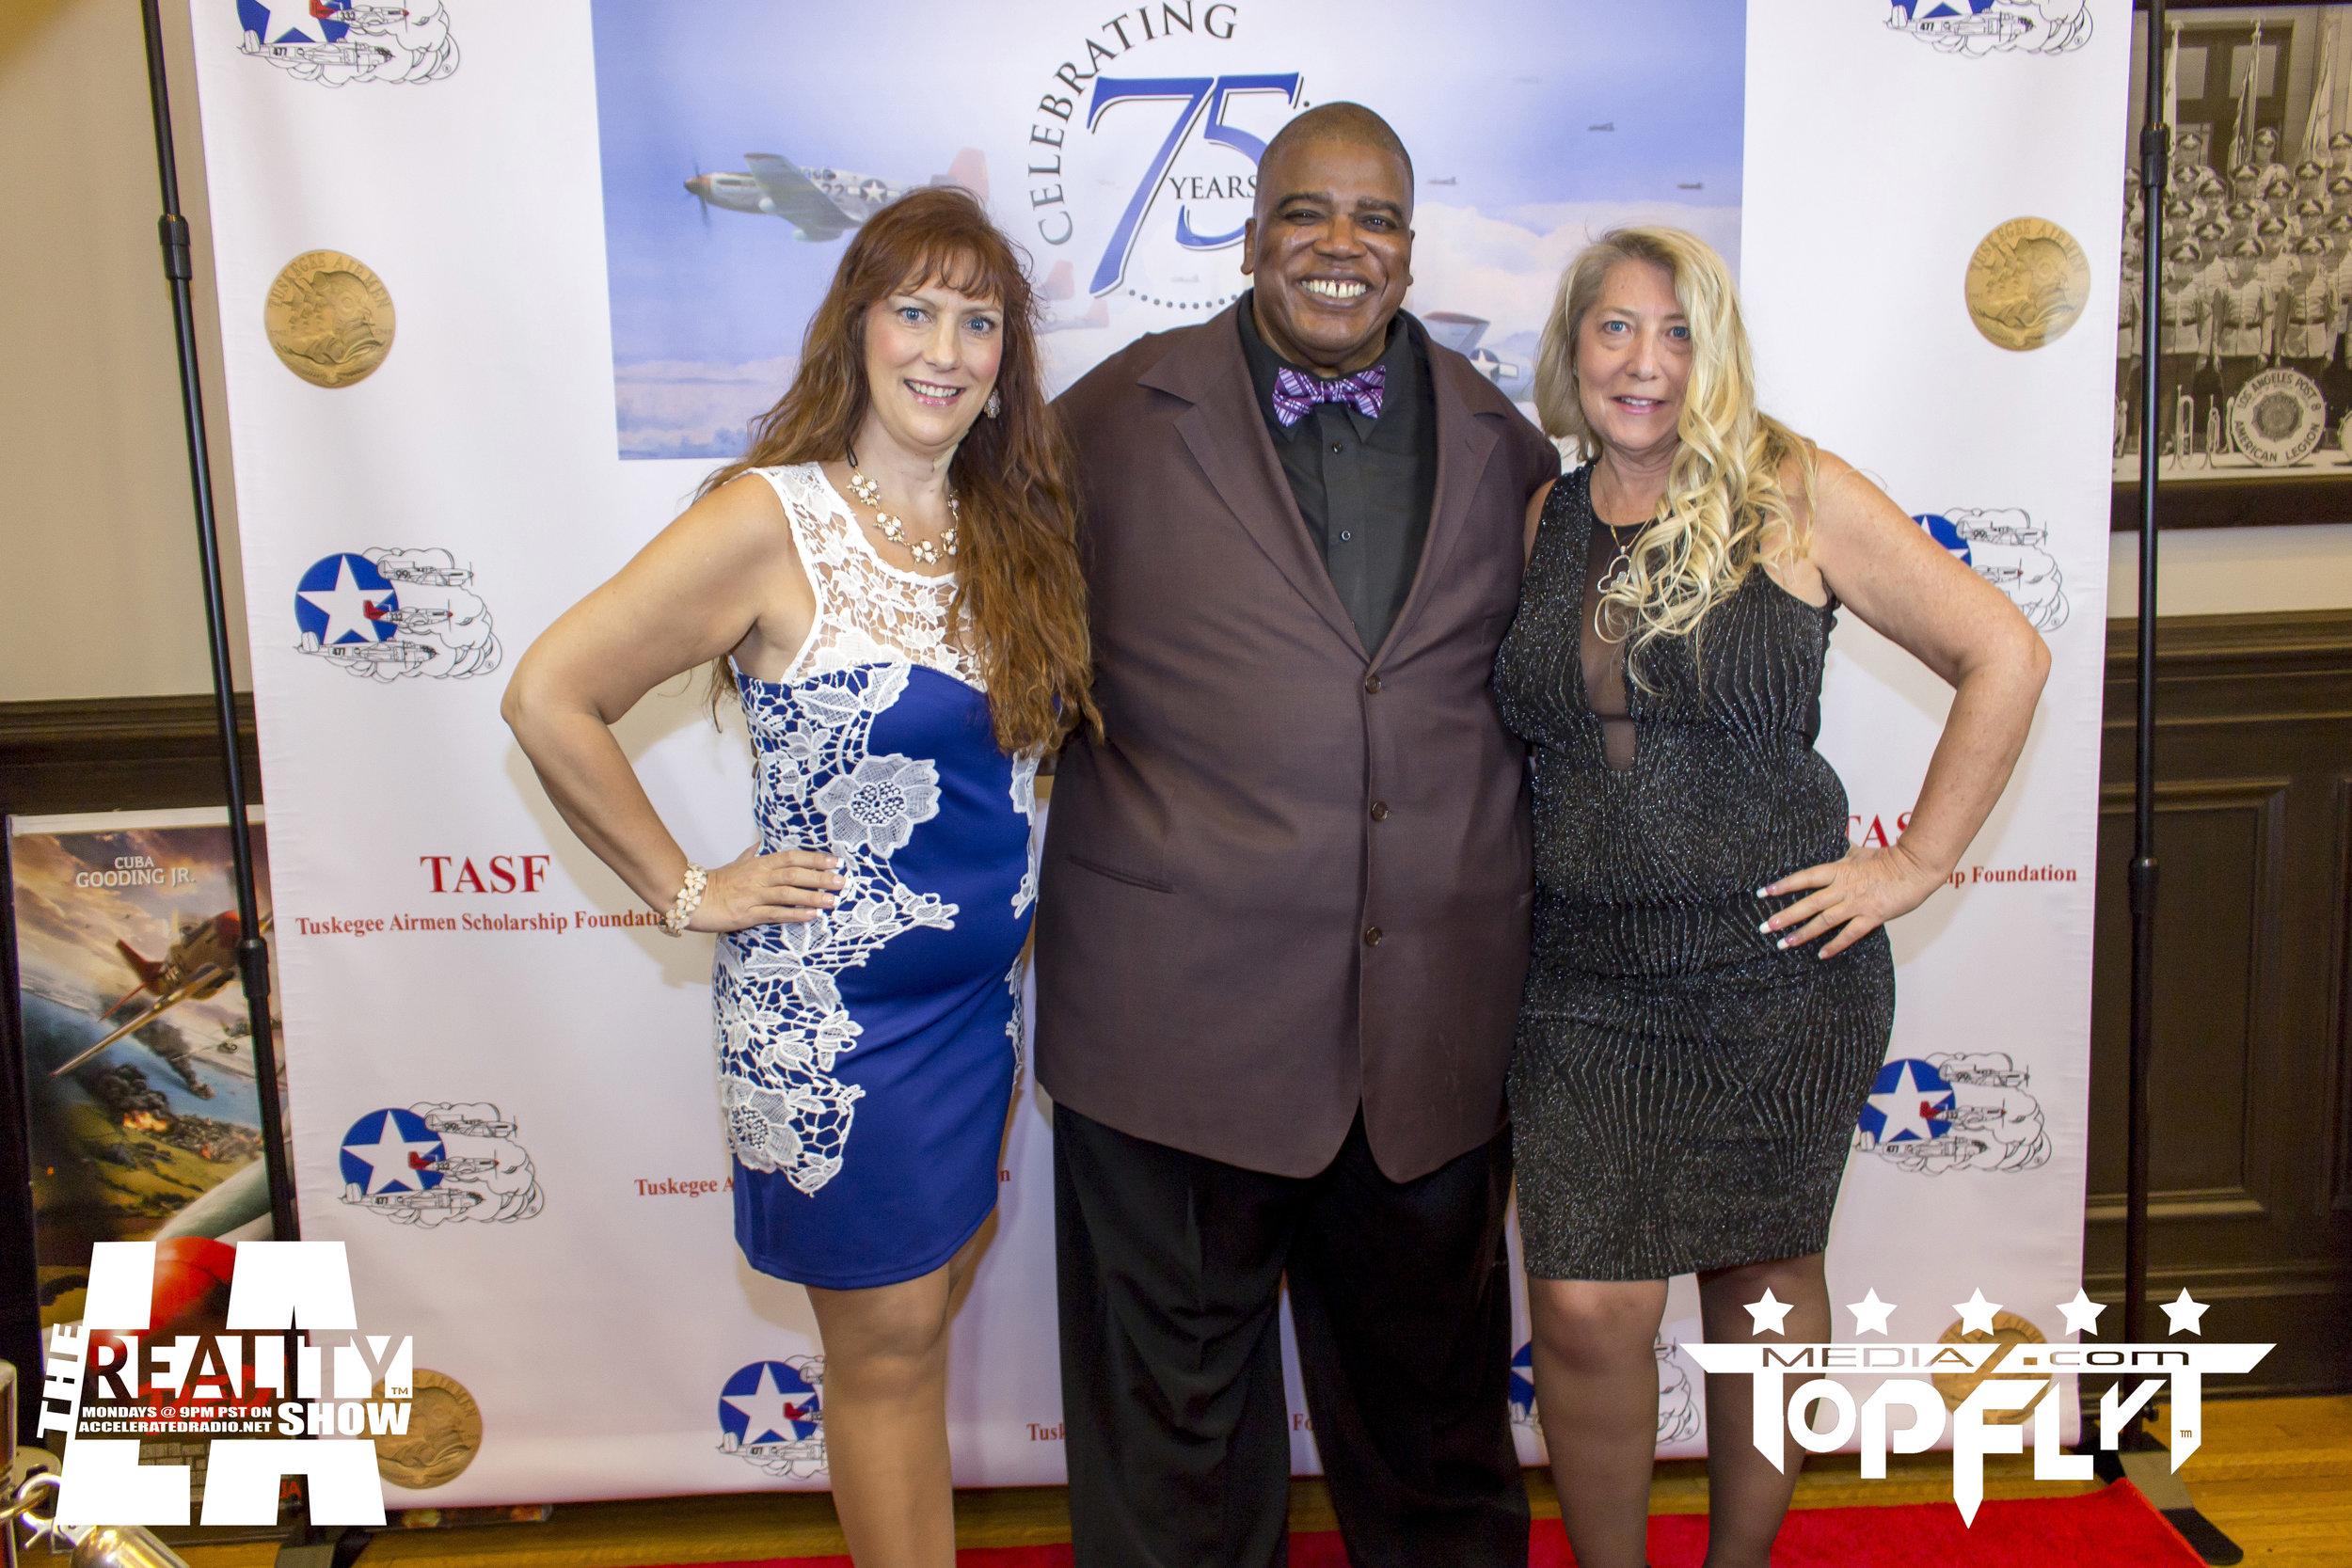 The Reality Show LA - Tuskegee Airmen 75th Anniversary VIP Reception_40.jpg